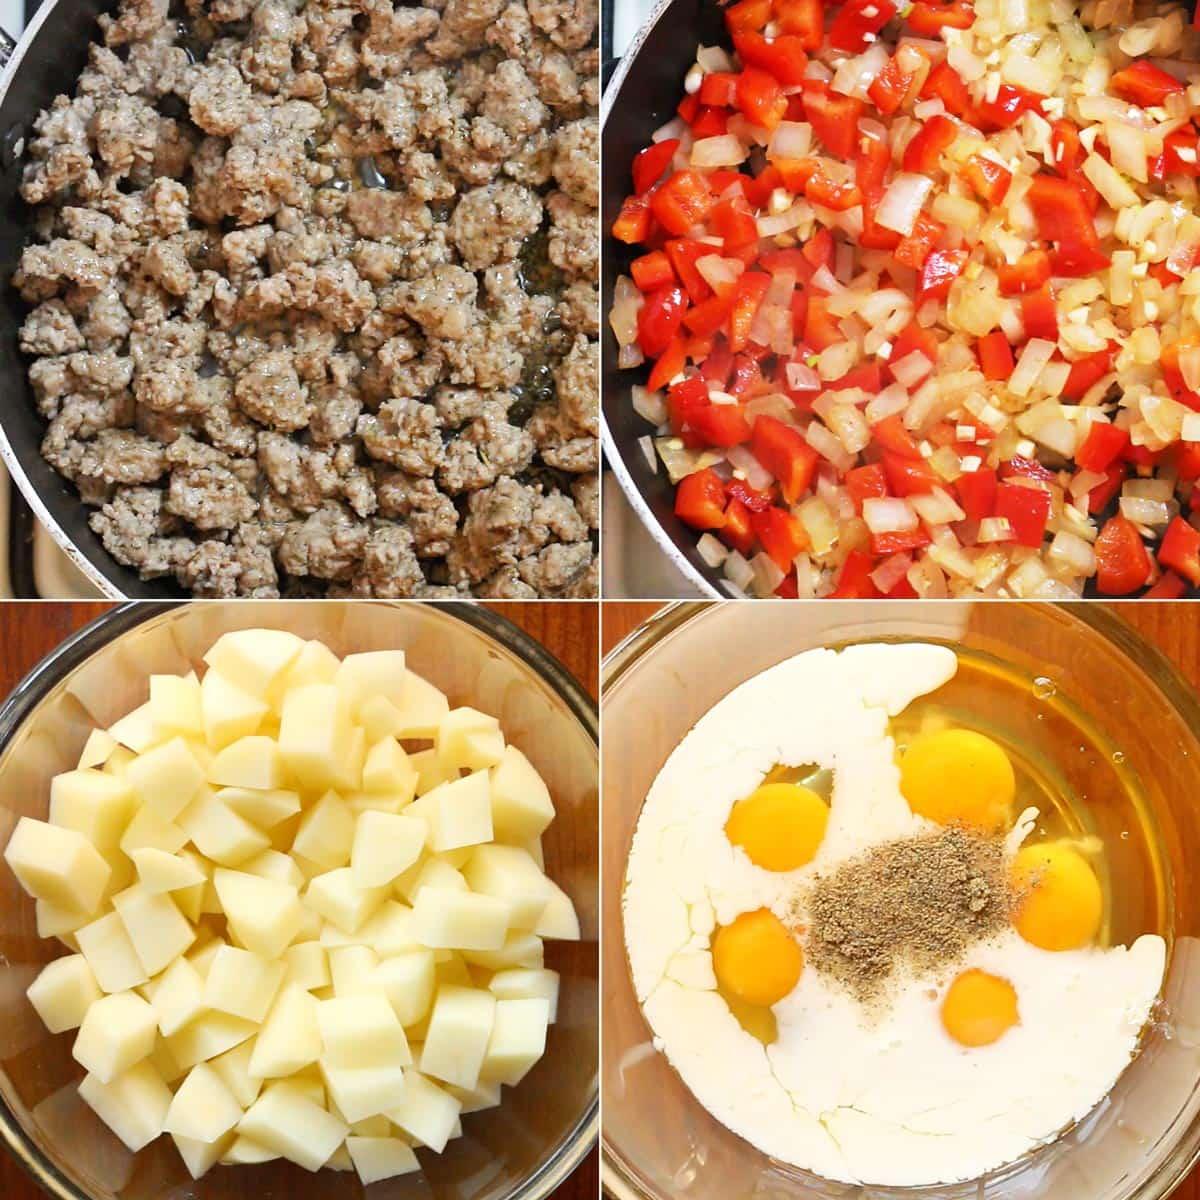 Ingredient collage: 1. Cooked sausage 2. sautéed veggies 3. potato cubes 4. egg mix